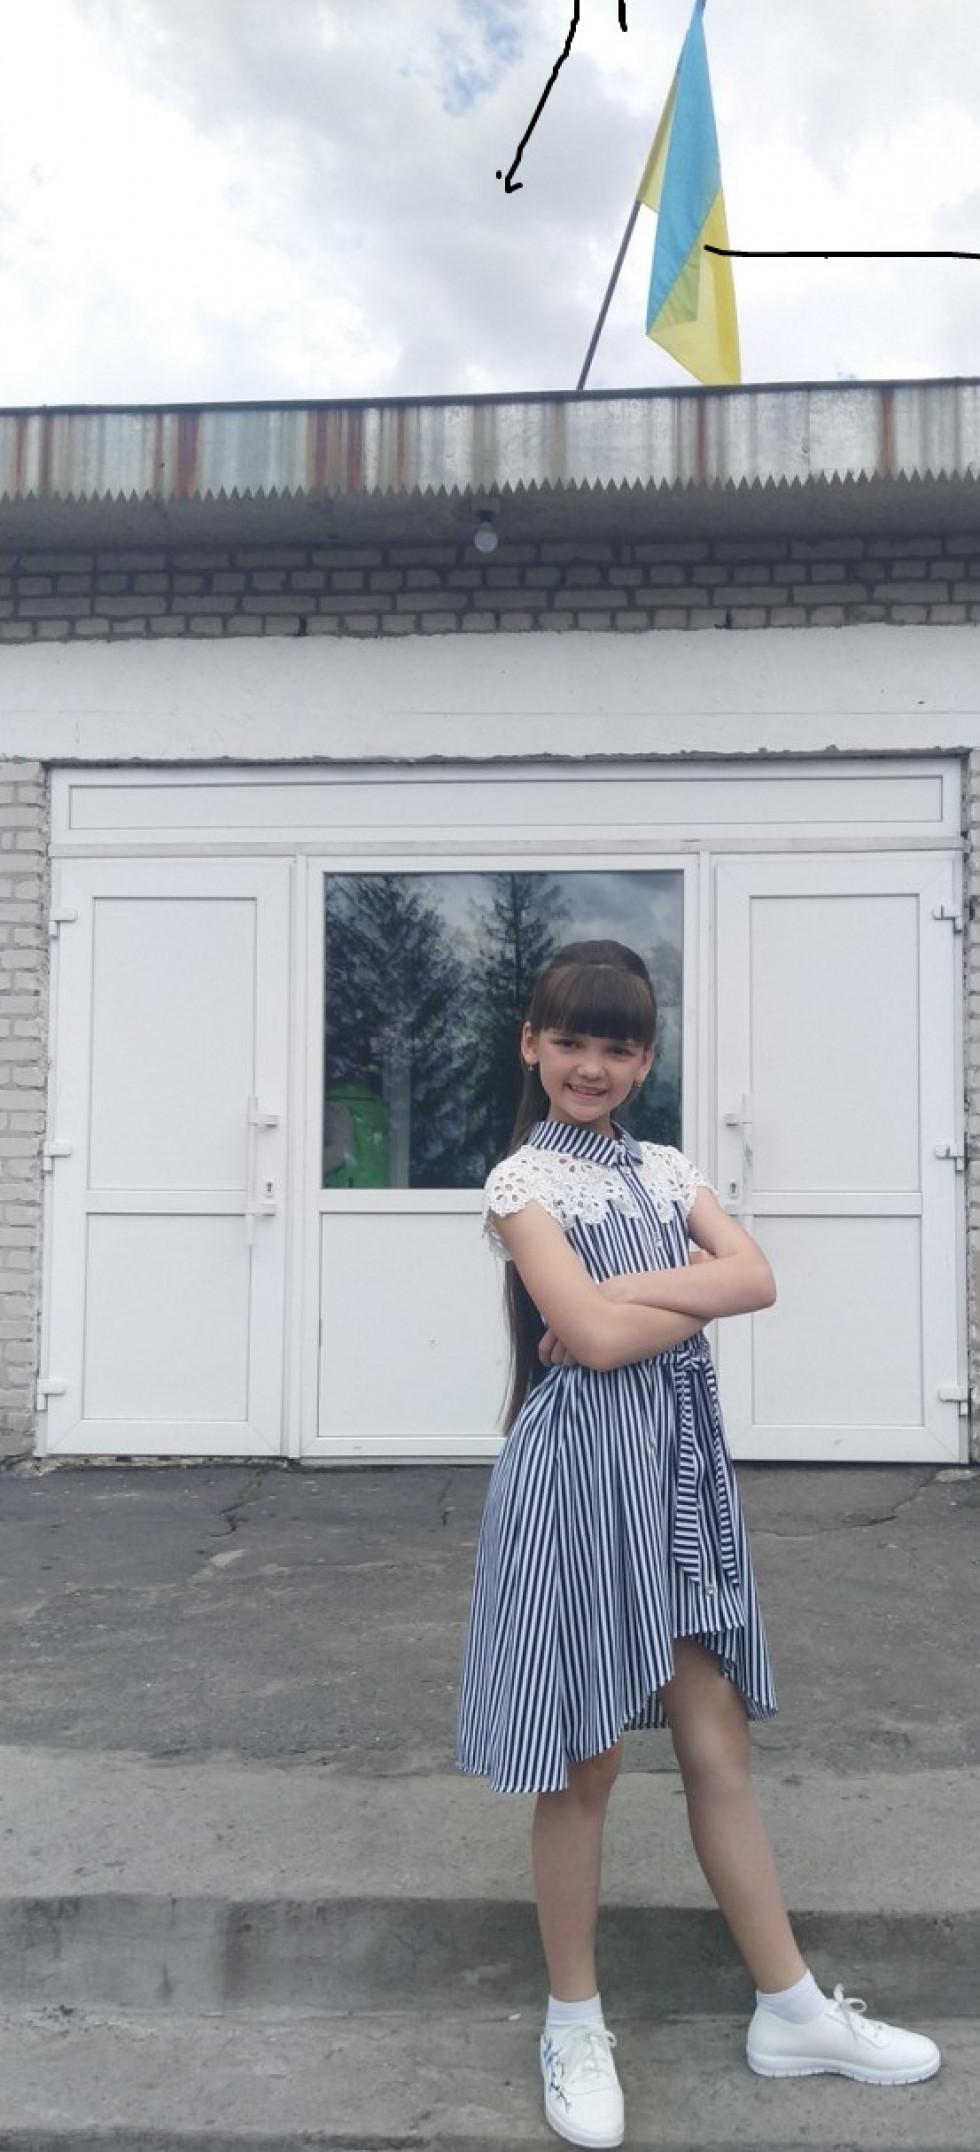 Прасюк Софія